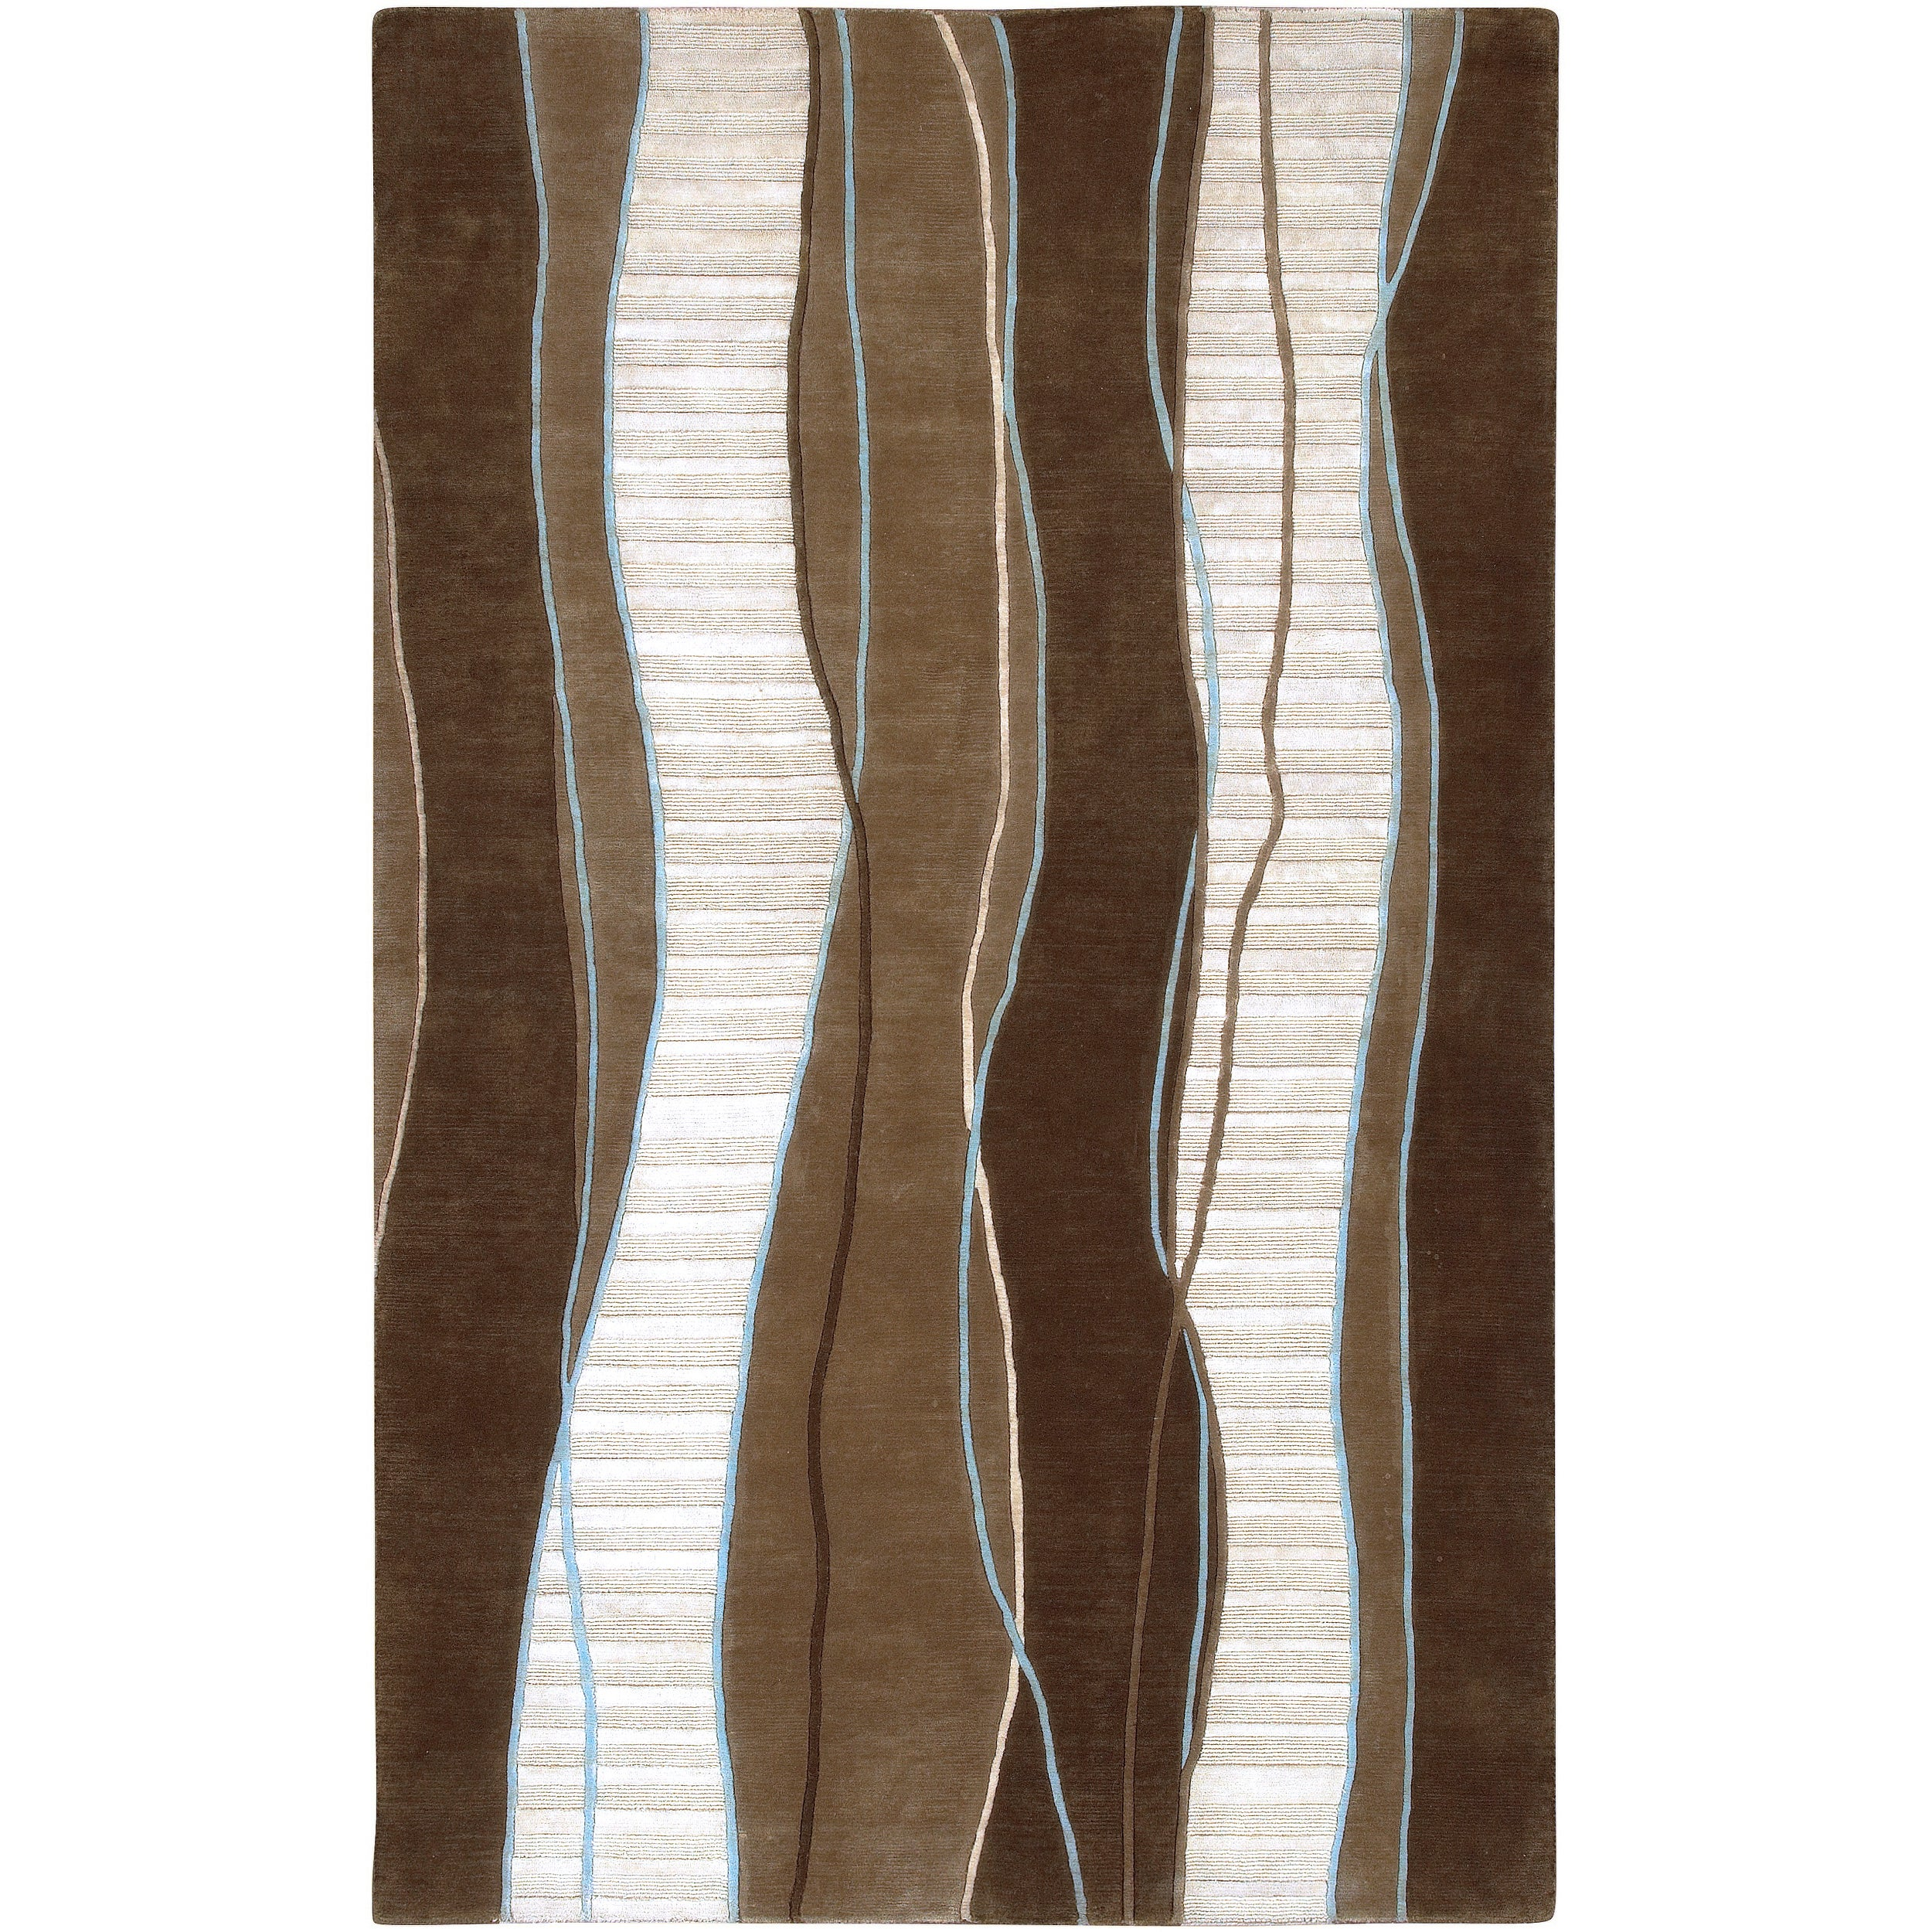 Hand-knotted Mackay Brown Geometric Wool Rug (9' x 13')